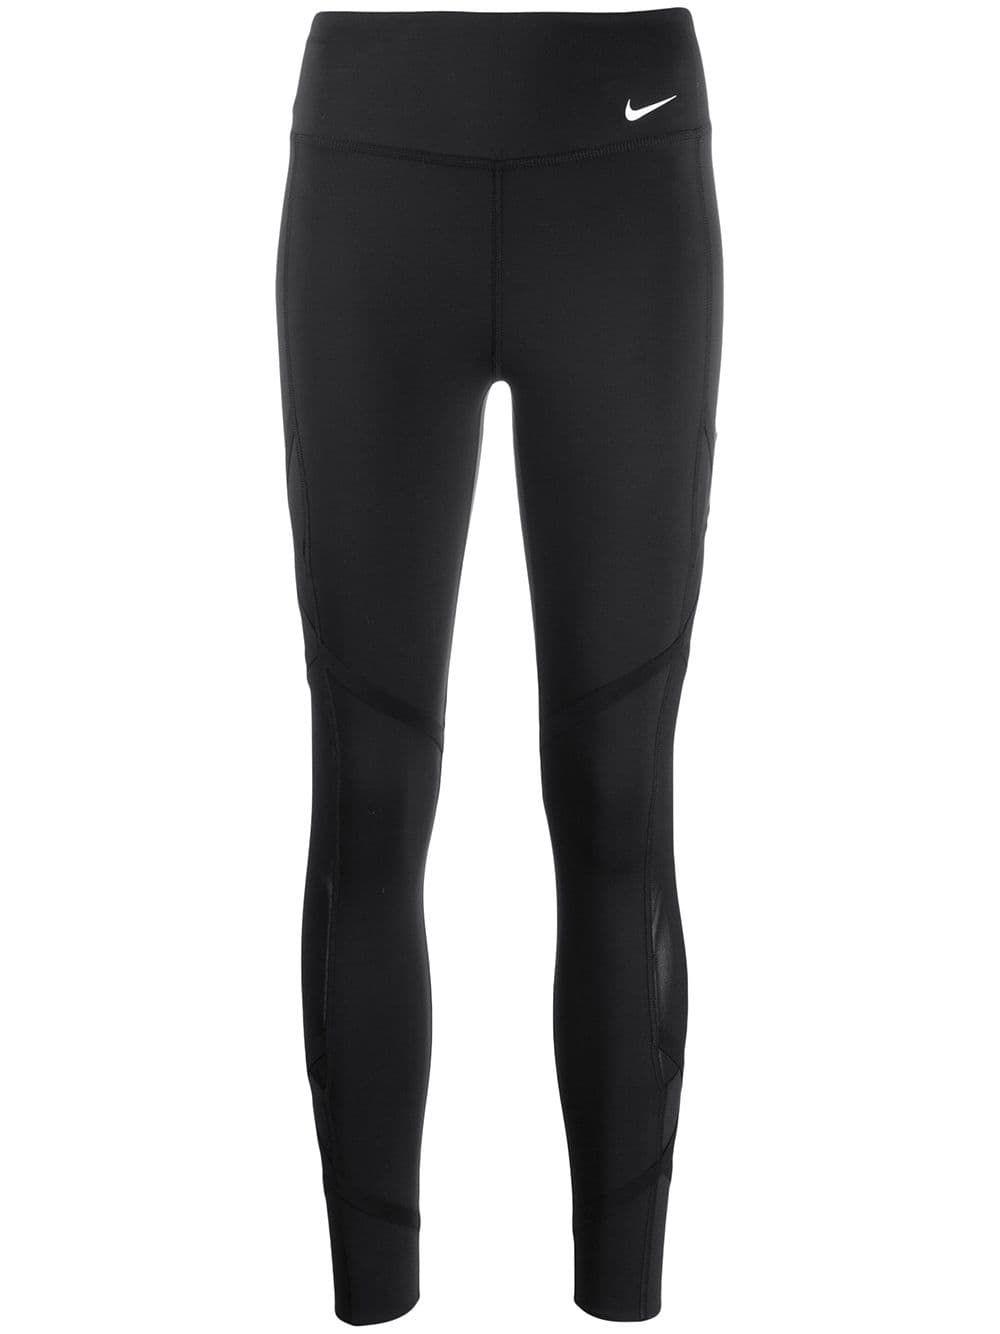 Panel leggings, Nike leggings women